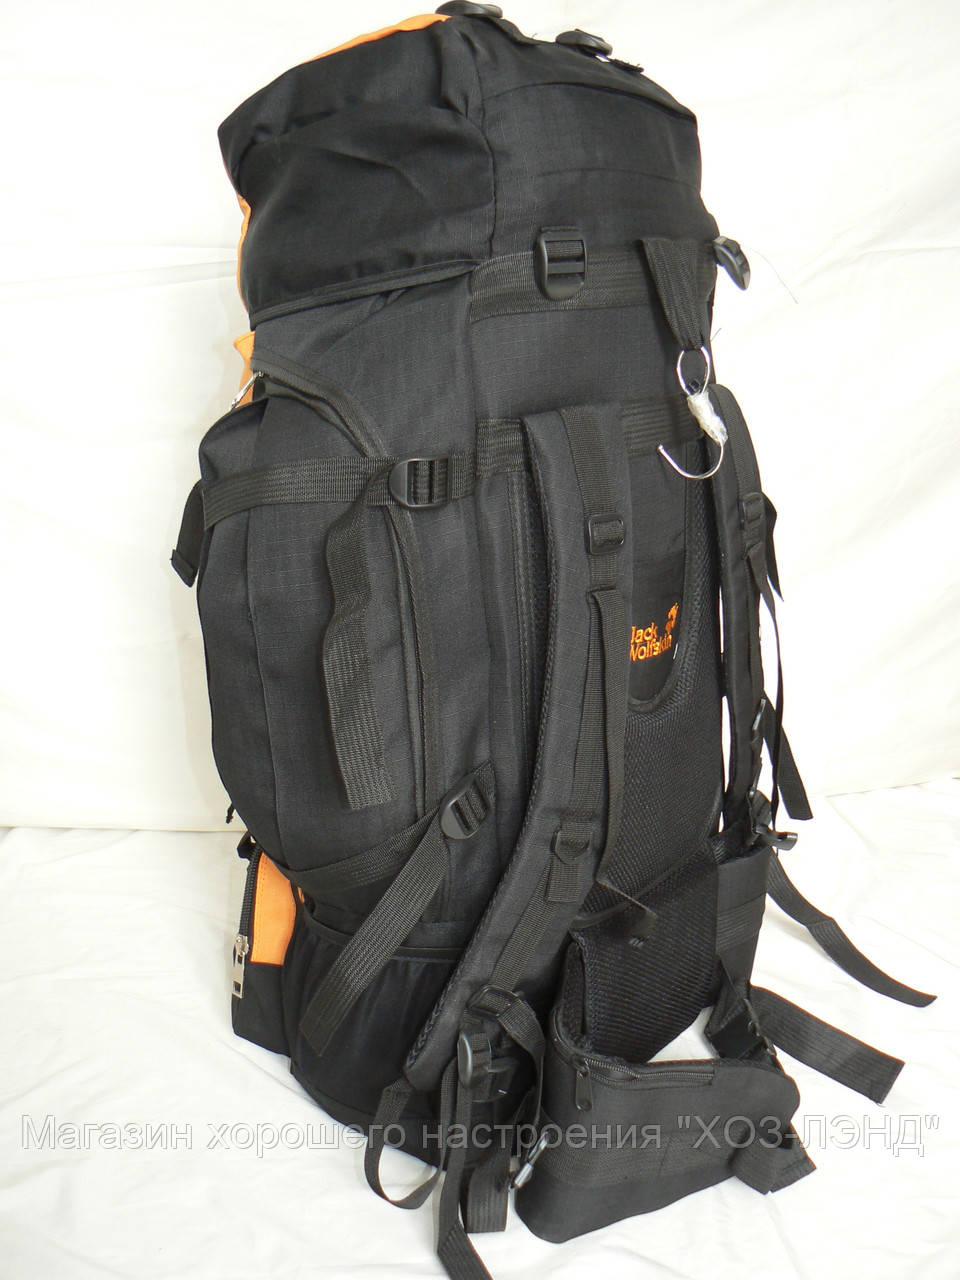 Туристический рюкзак 80л jack wolfskin пошить лямки к рюкзаку